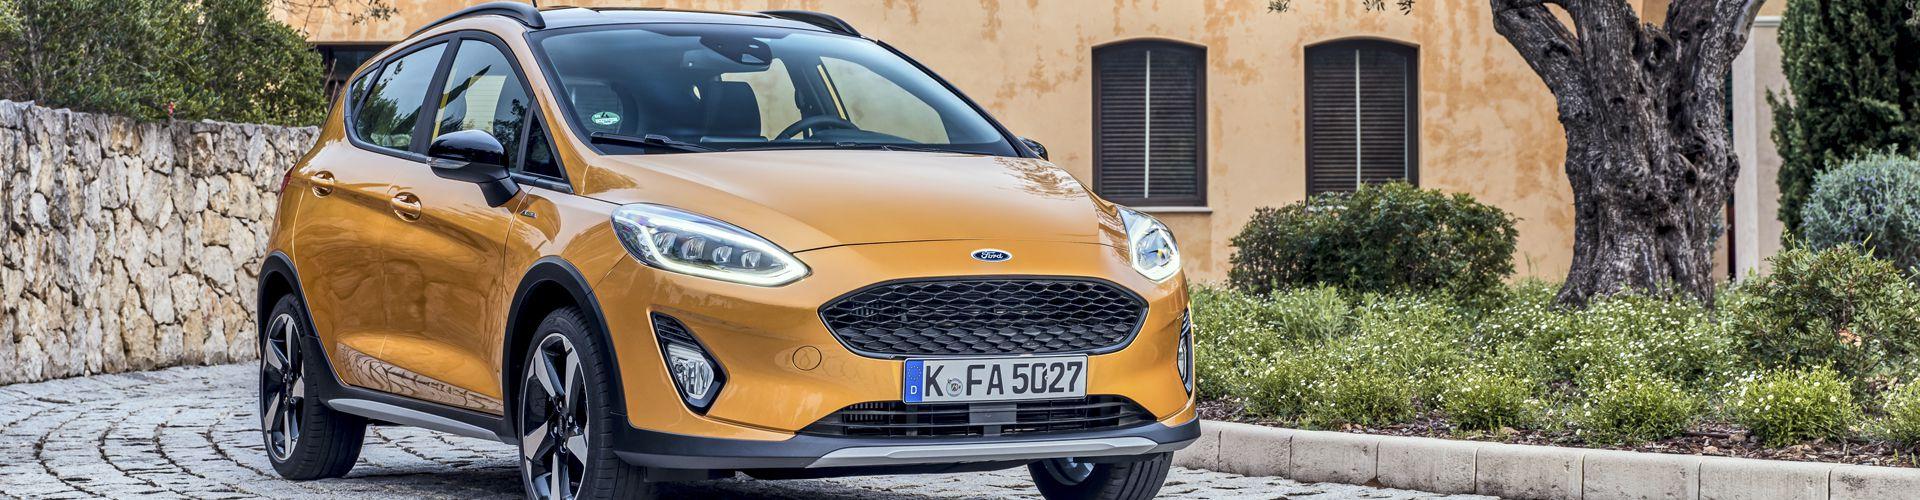 Ford Fiesta Active X - Αφοί Λιάπη